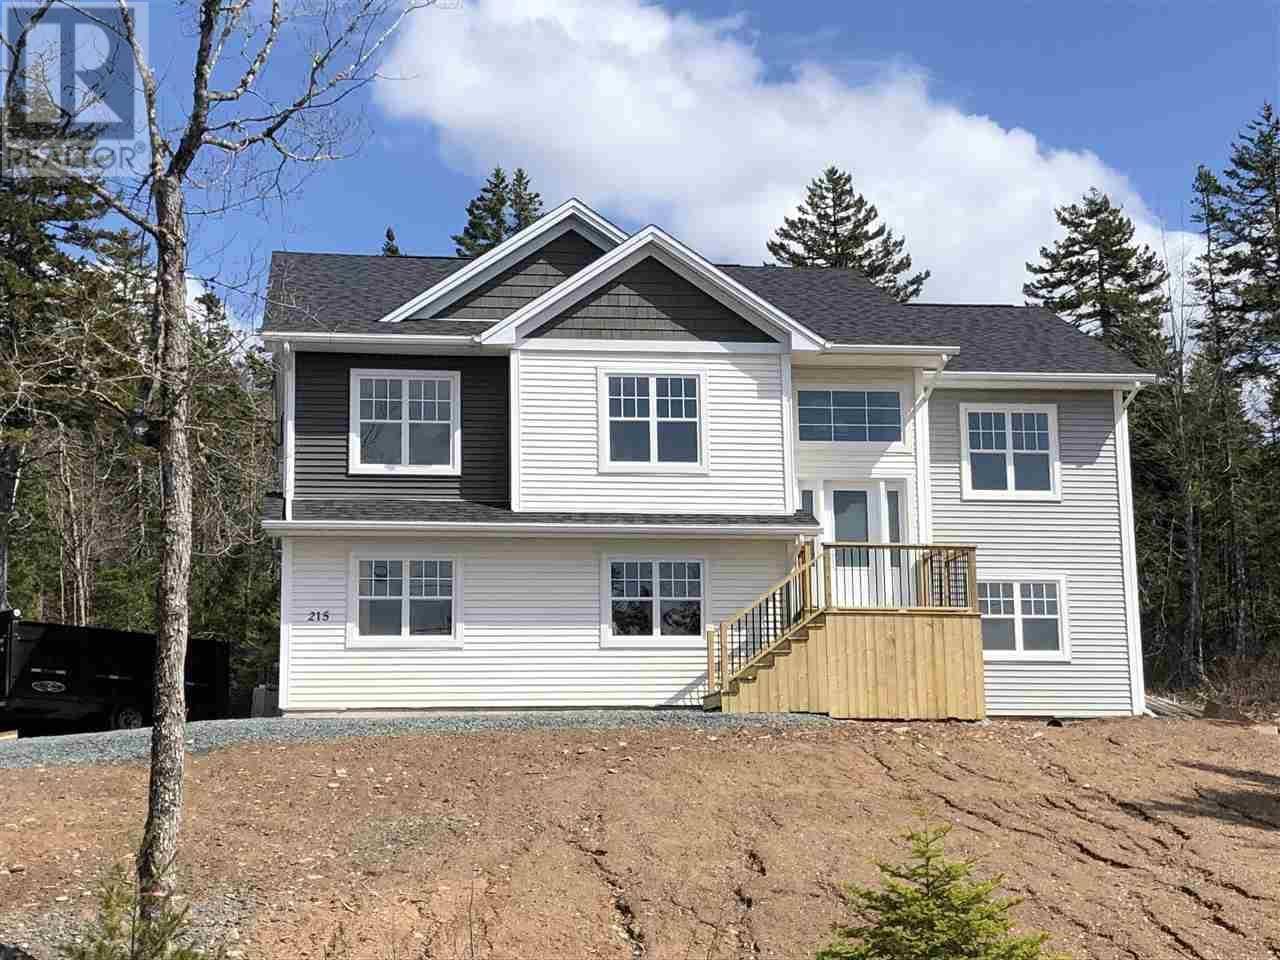 House for sale at 215 Confederation Ave Unit 678 Fall River Nova Scotia - MLS: 201913206